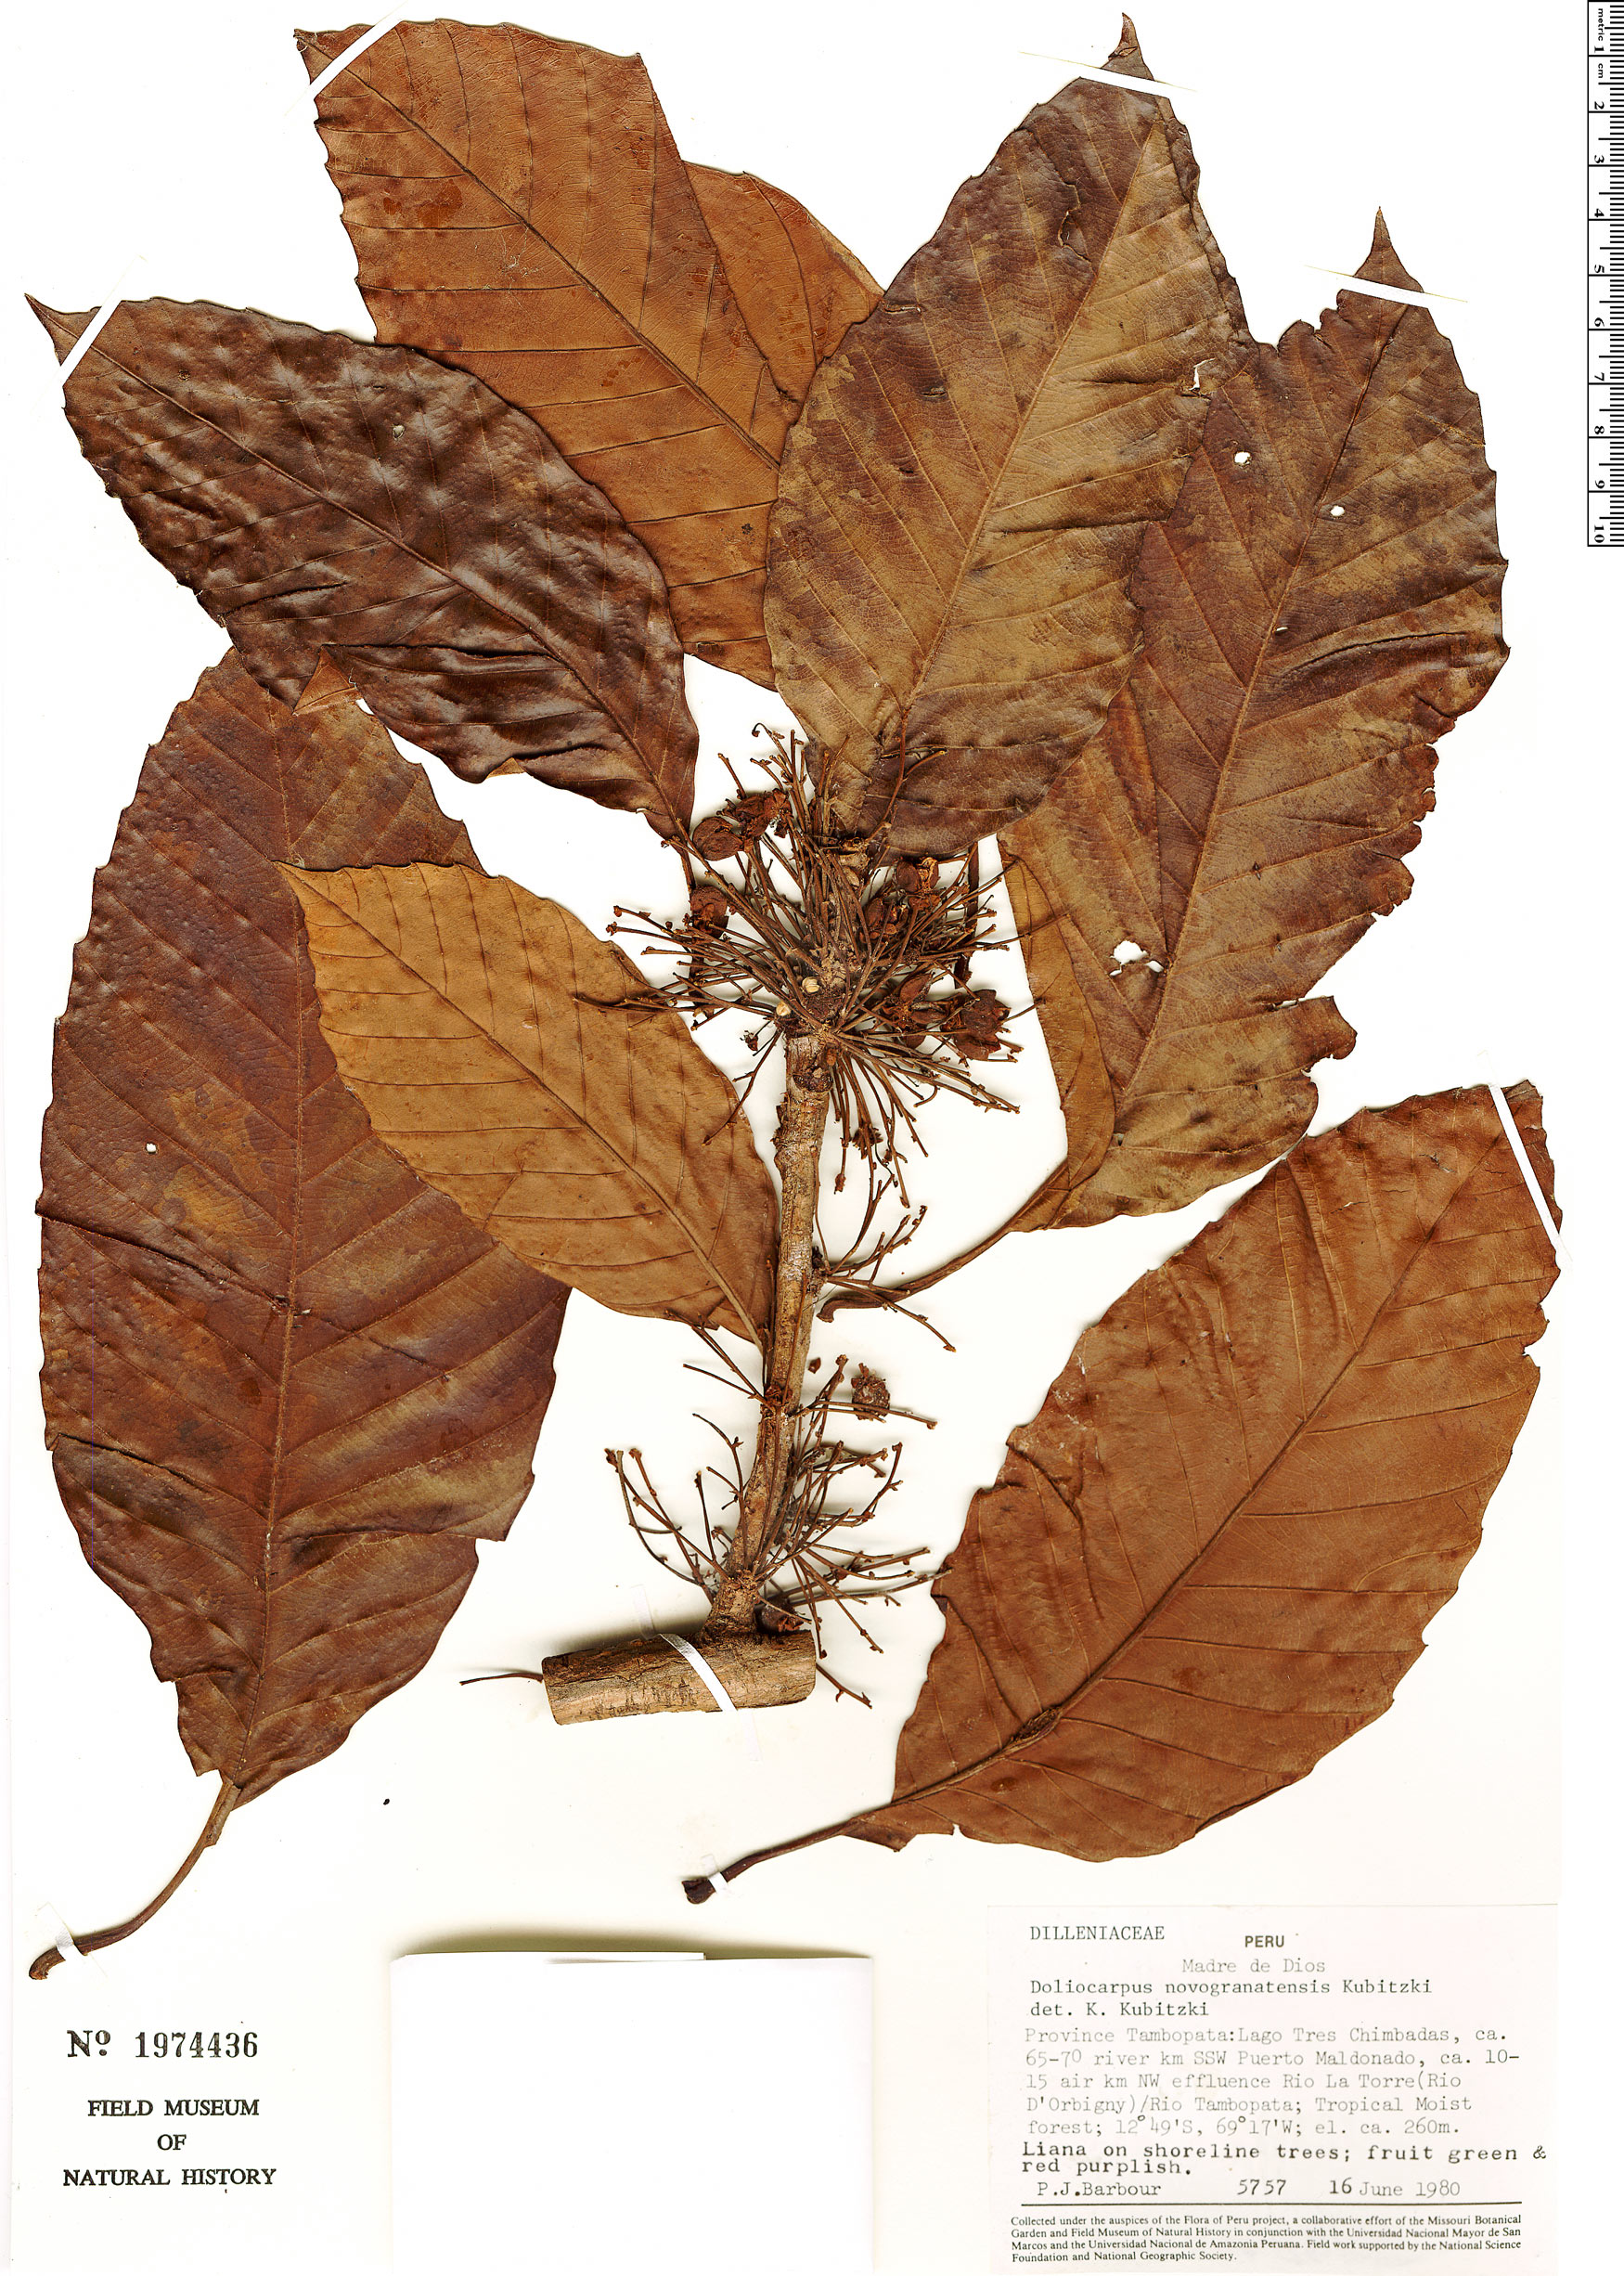 Specimen: Doliocarpus novogranatensis